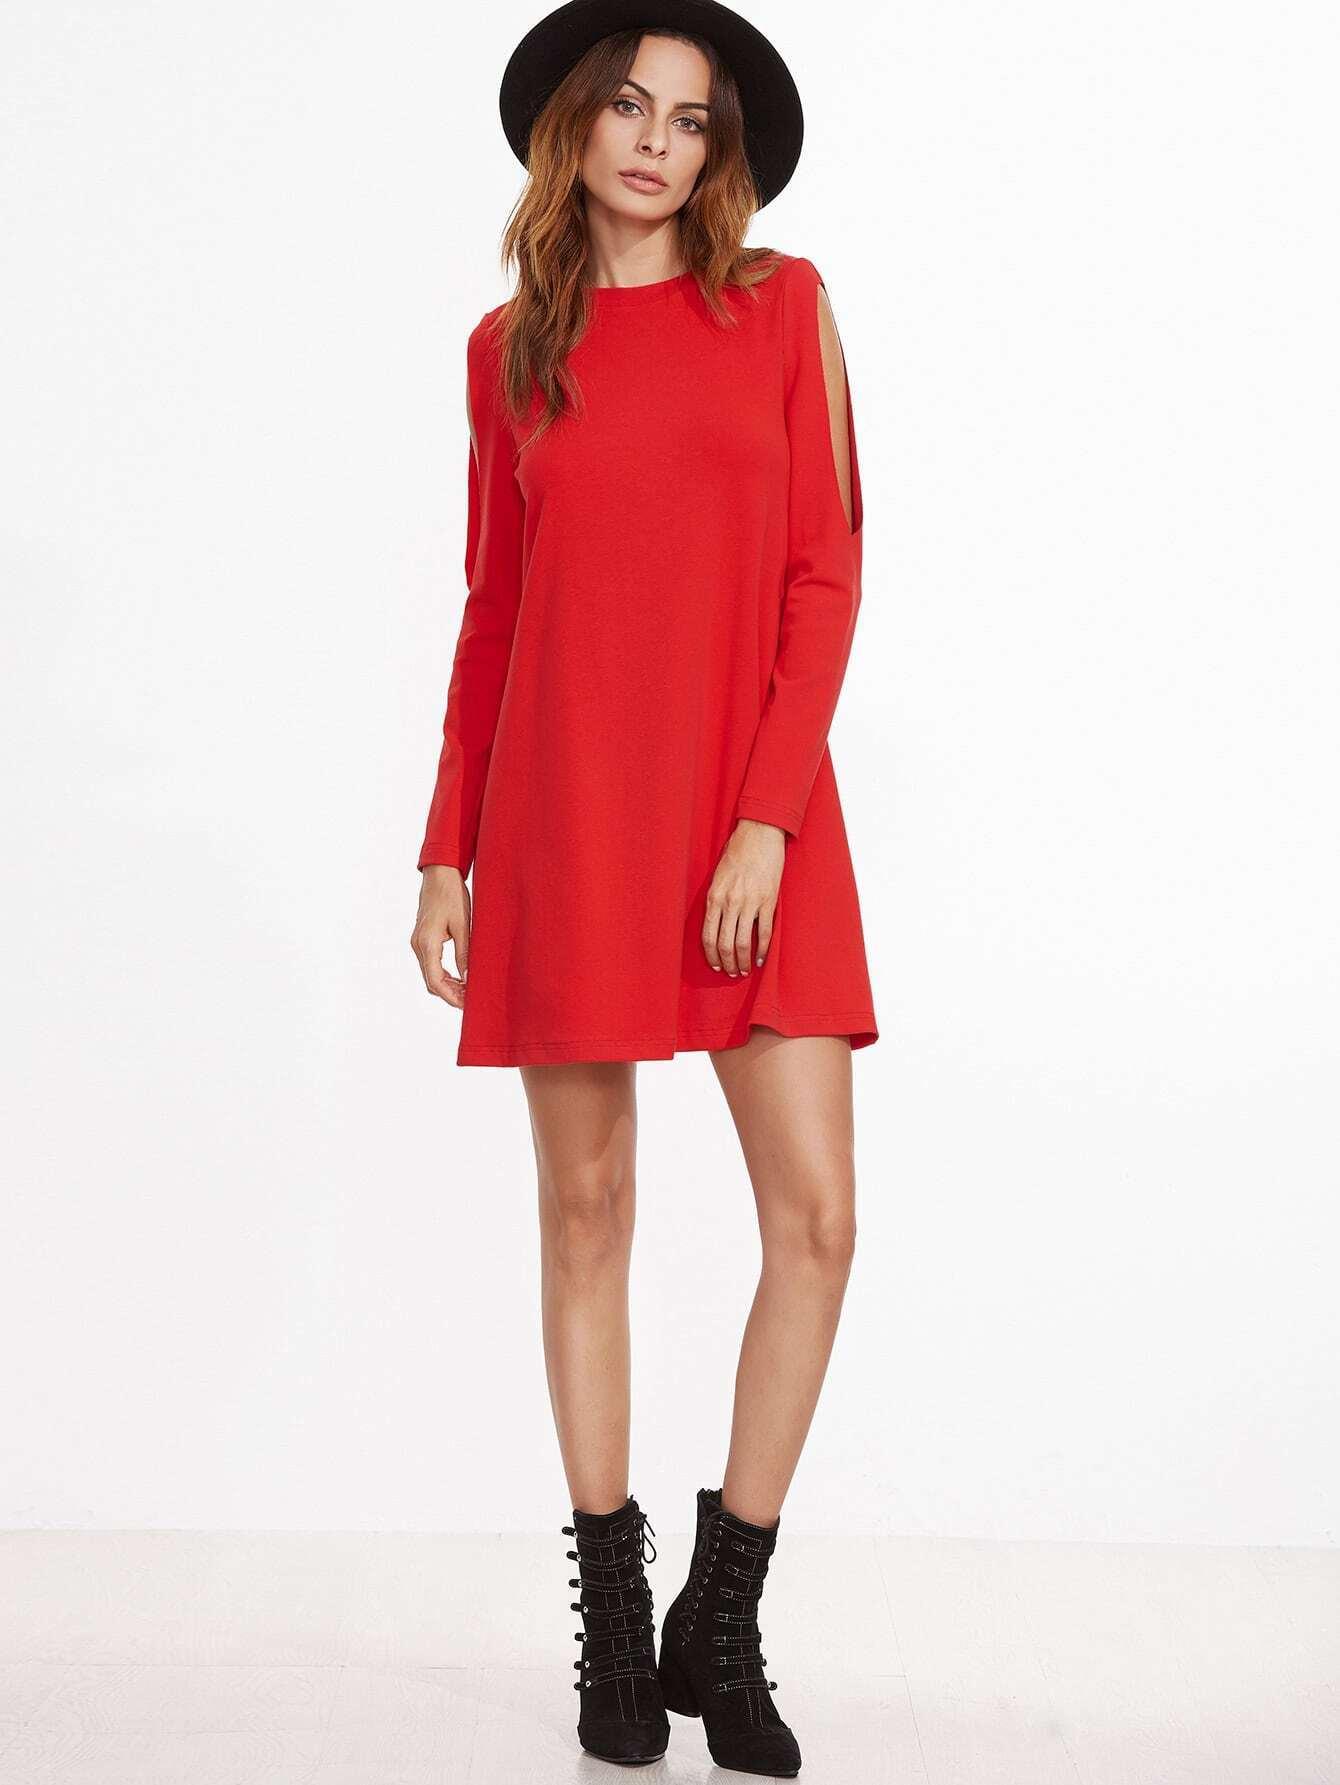 Red Crew Neck Cut Out Long Sleeve Shift Dress -SheIn(Sheinside)